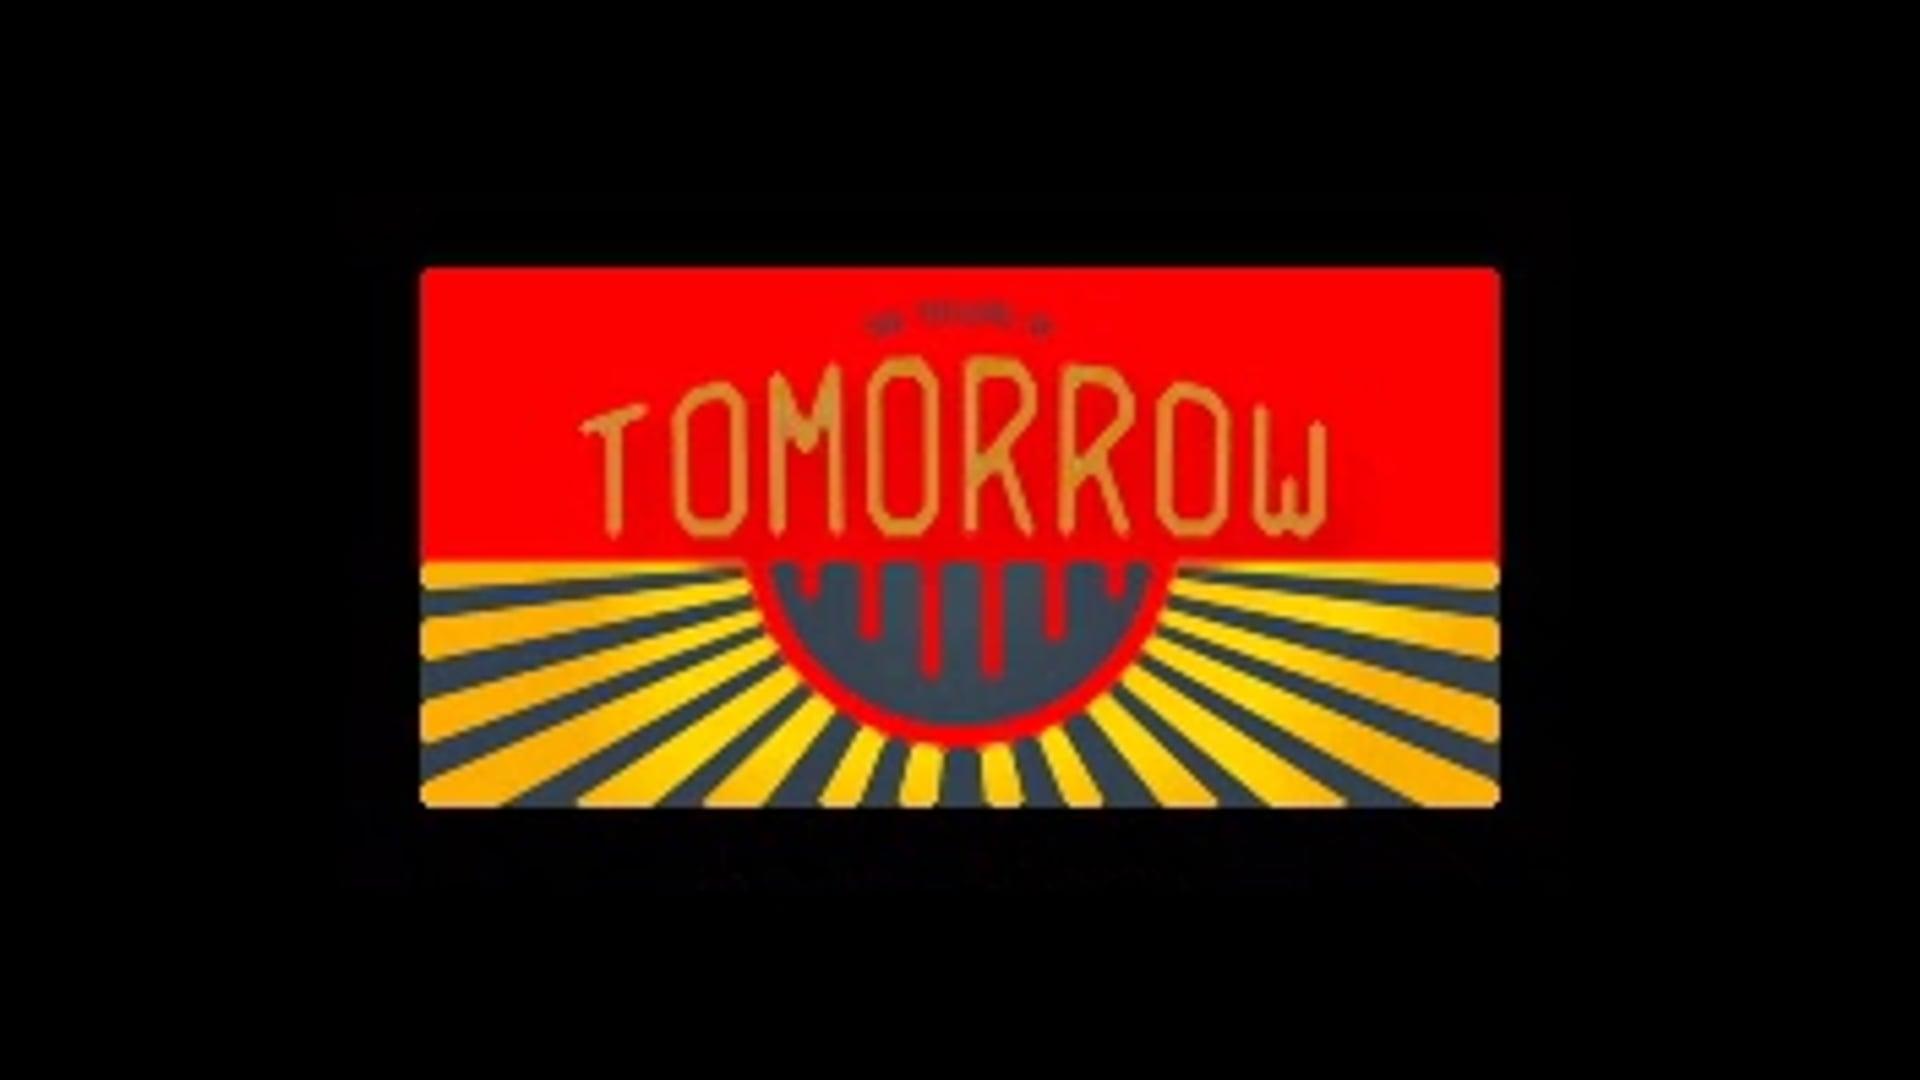 Kelly VO - Theatre of Tomorrow